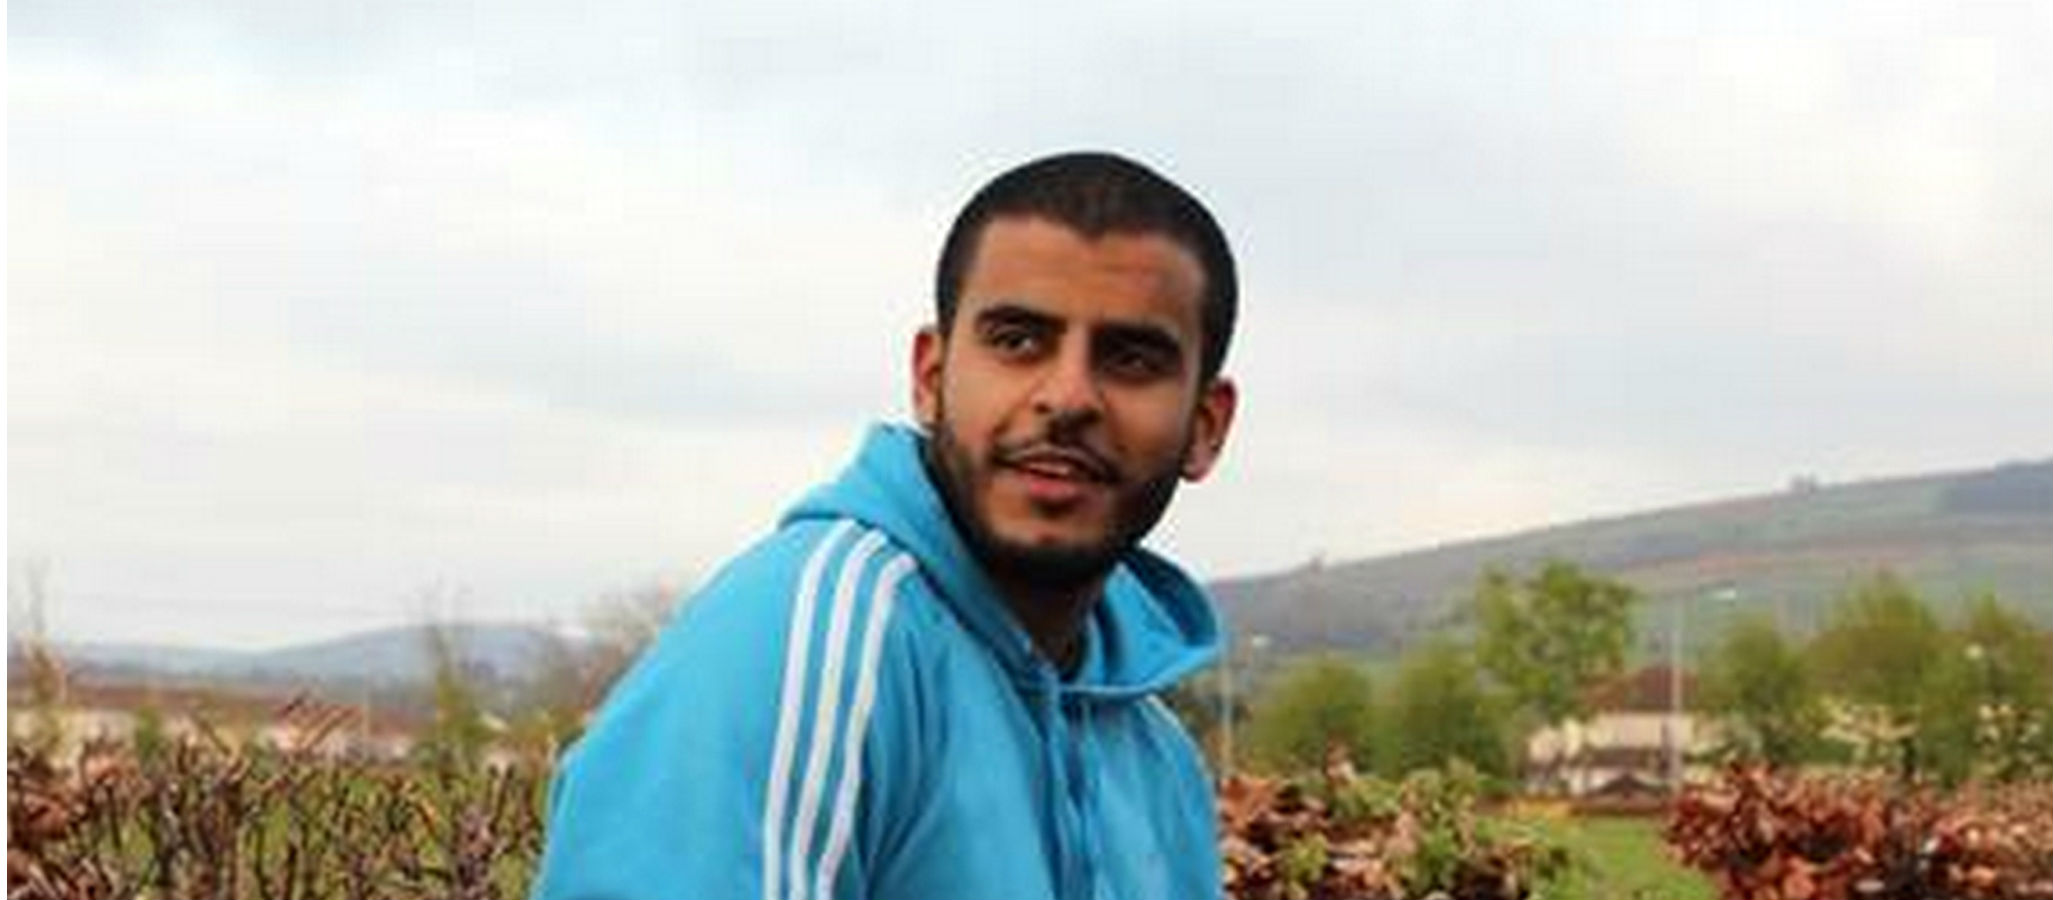 Ibrahim Halawa's Trial's Adjourned Again